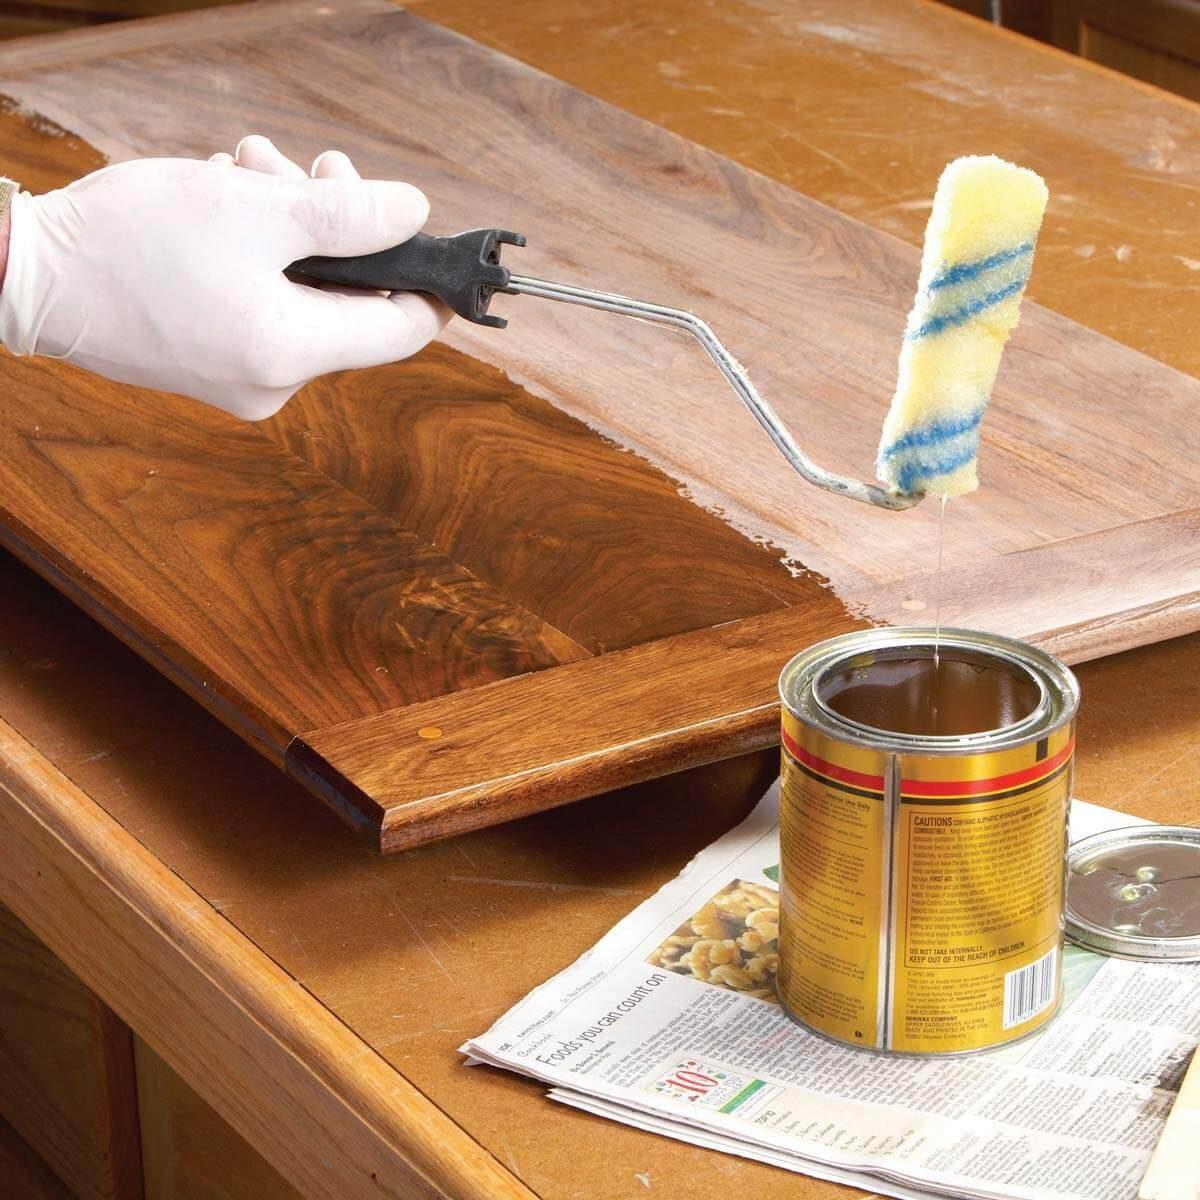 18 handy hints for wood finishing   family handyman